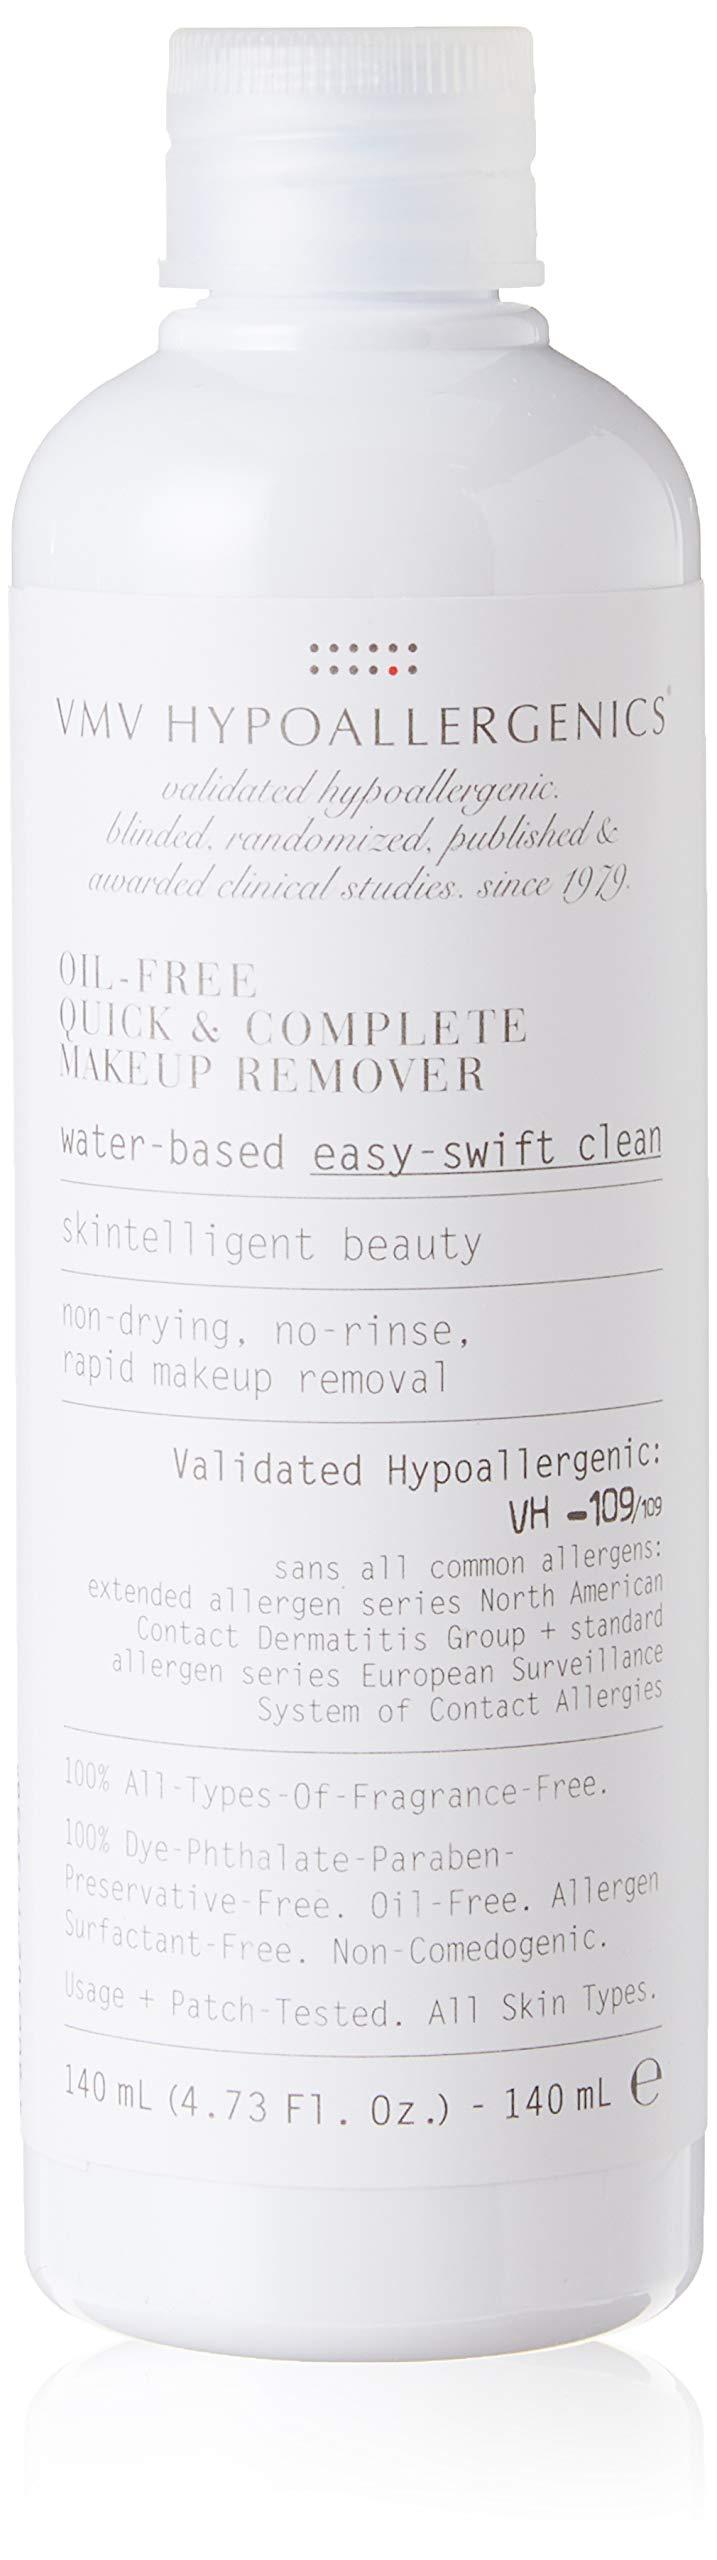 VMV Hypoallergenics Oil-free Quick & Complete Makeup Remover